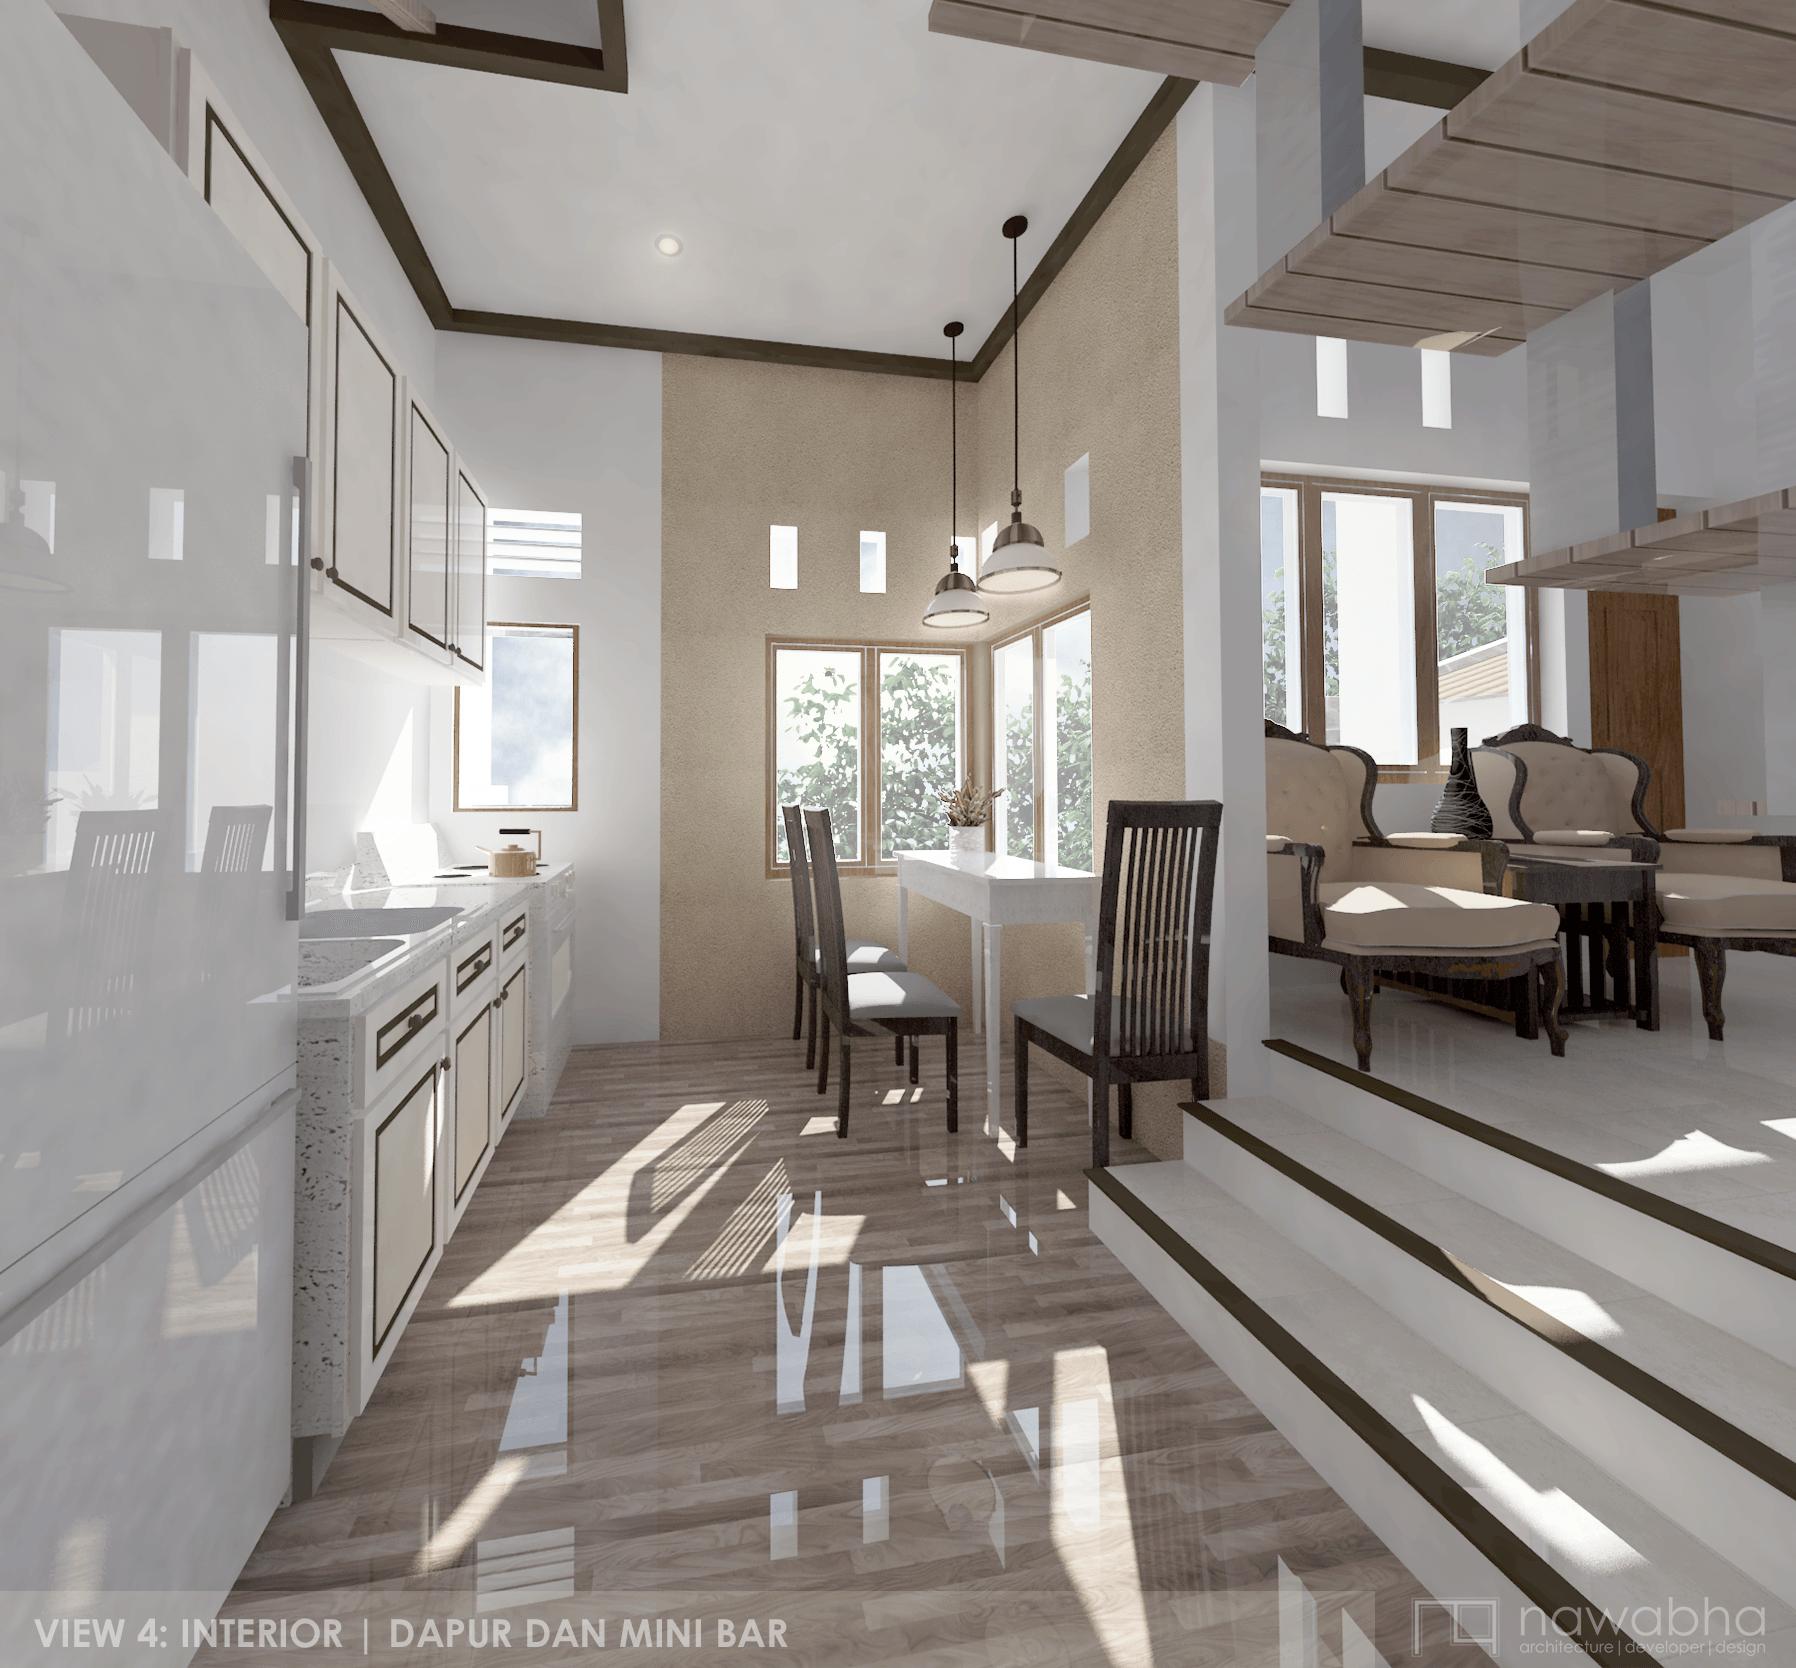 Nawabha Griya Asri Cipageran - Family House Cimahi, Bandung Cimahi, Bandung Interior-Renovasi Modern  24950